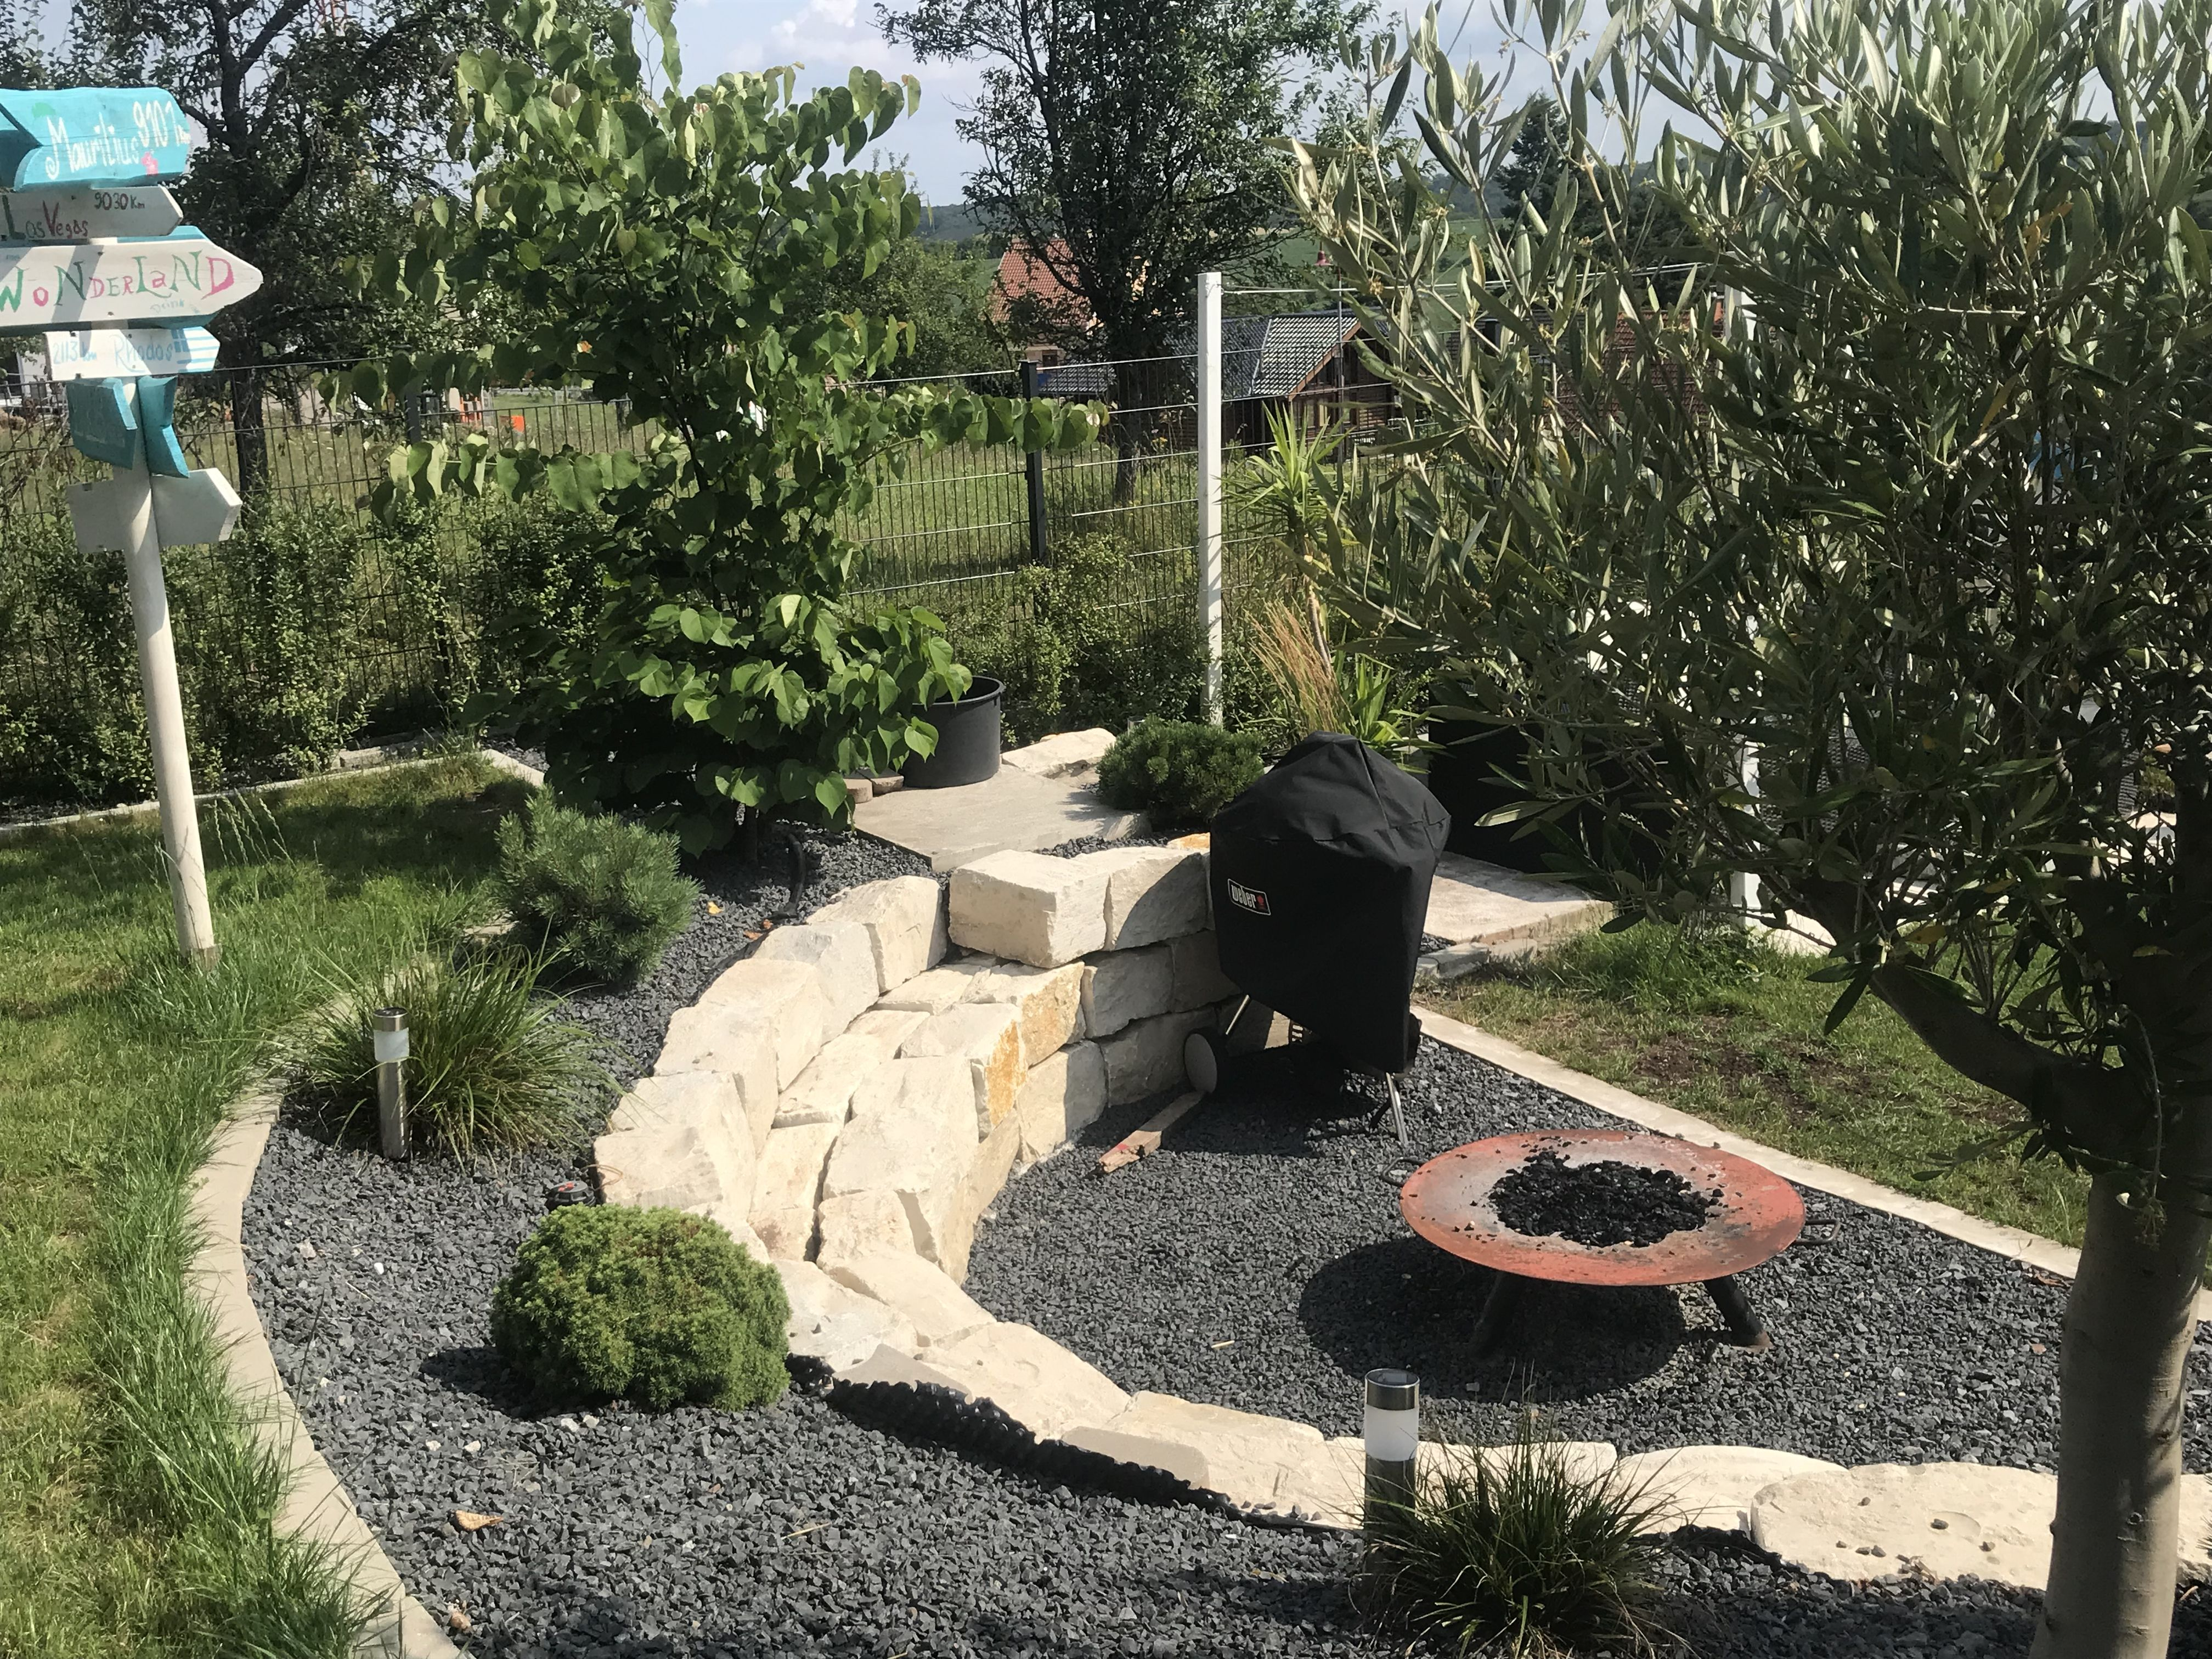 Feuerstelle Garten Garten Ideen Feuerstelle